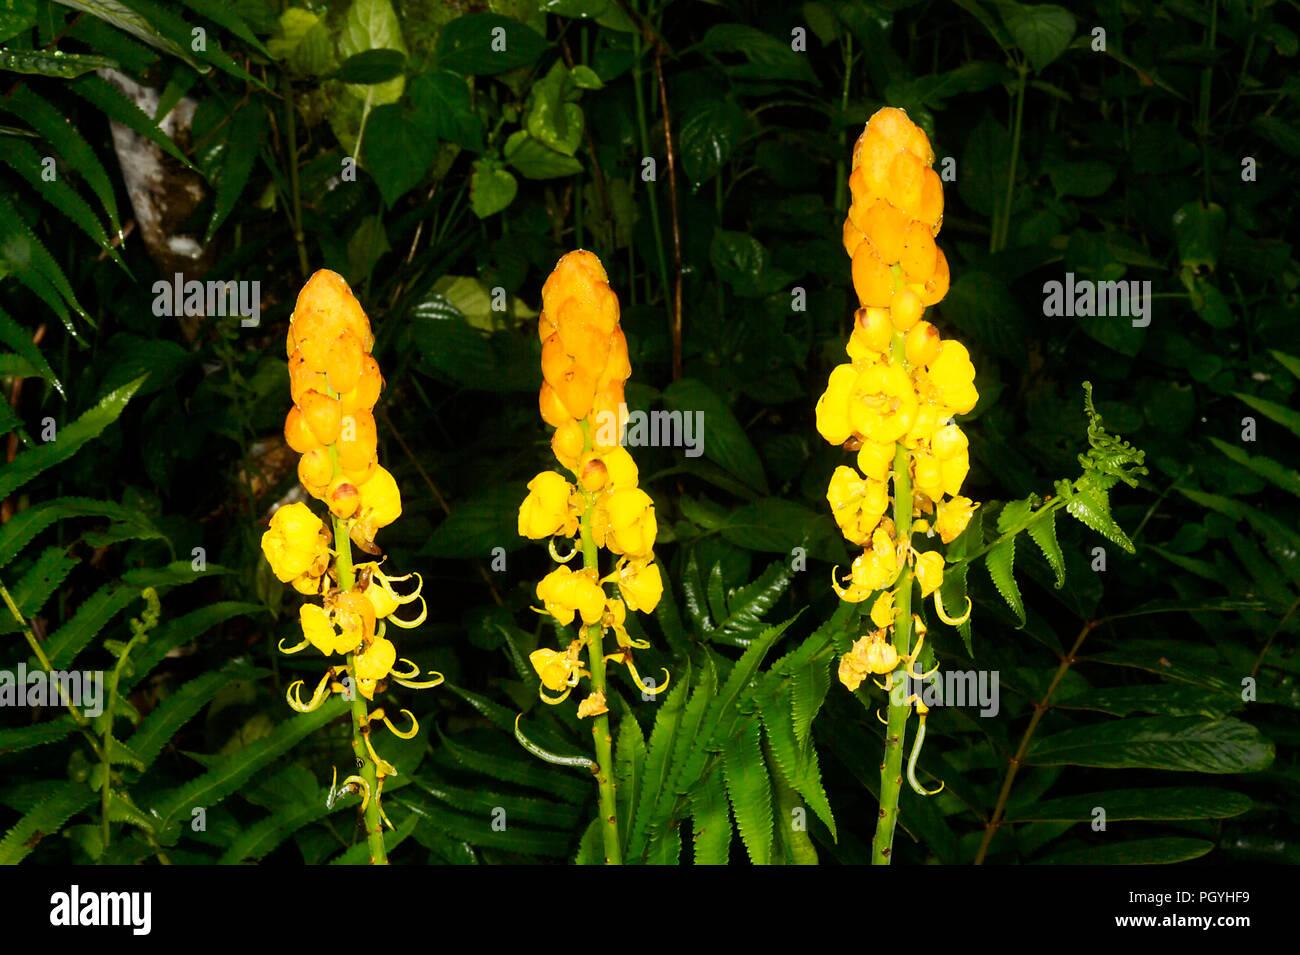 Seven Golden Candlestick (Cassia Alata), Tabin, near Lahad Datu, Borneo, Sabah, Malaysia - Stock Image